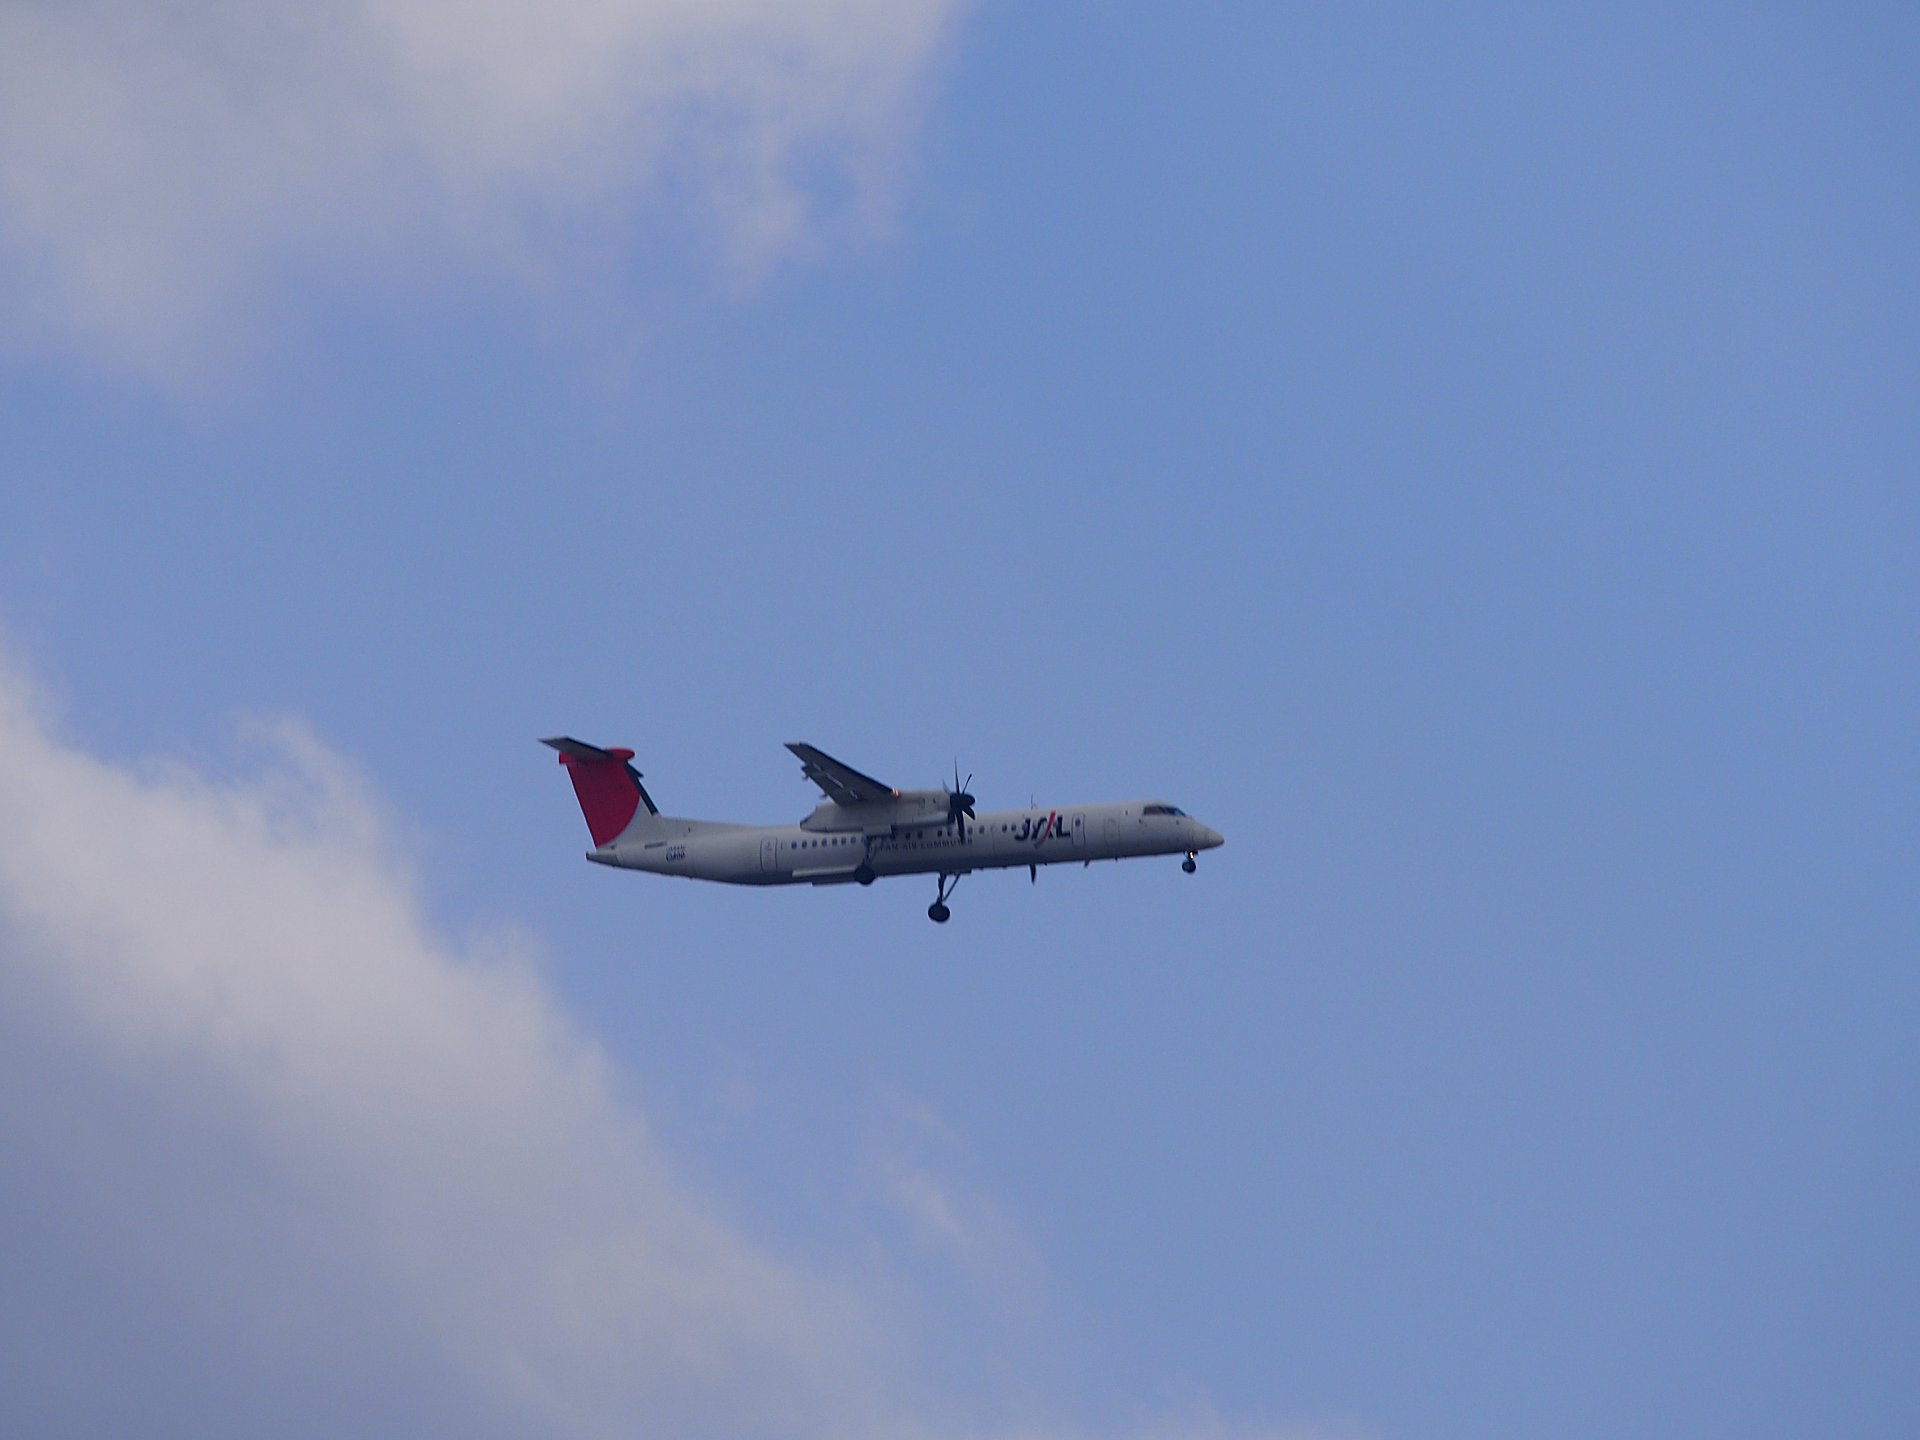 JALのボンバル機です。